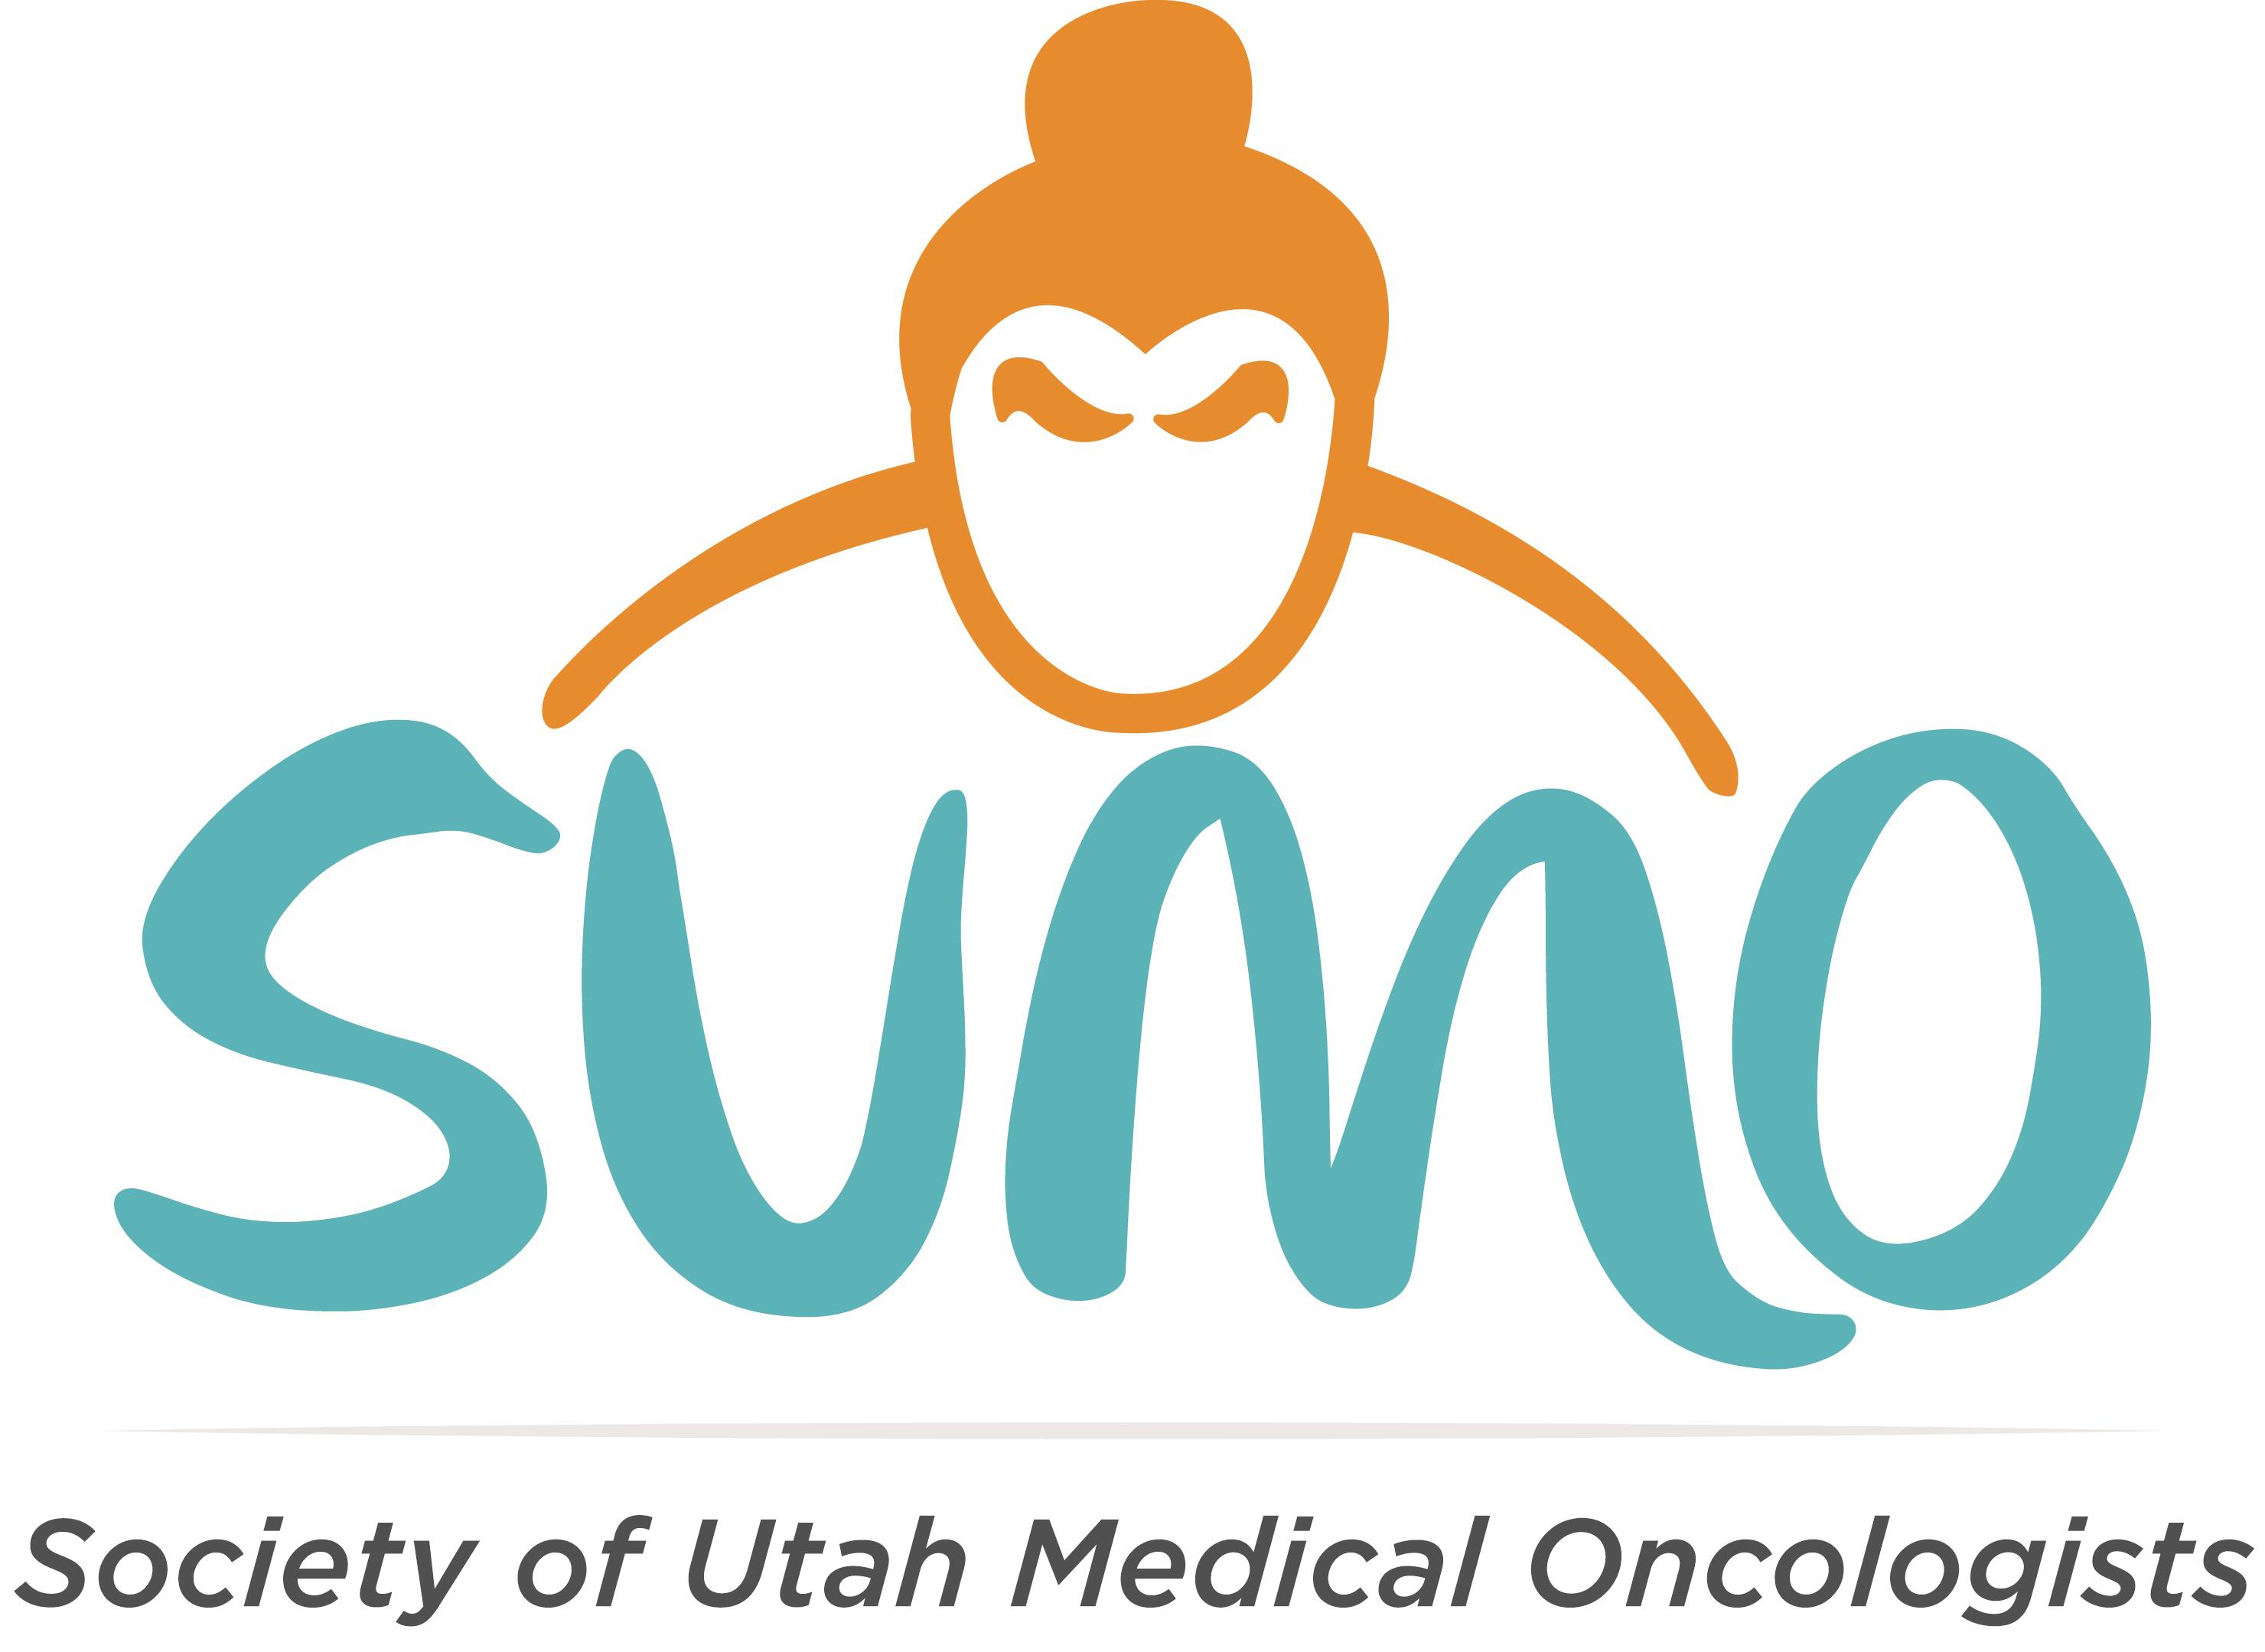 Society of Utah